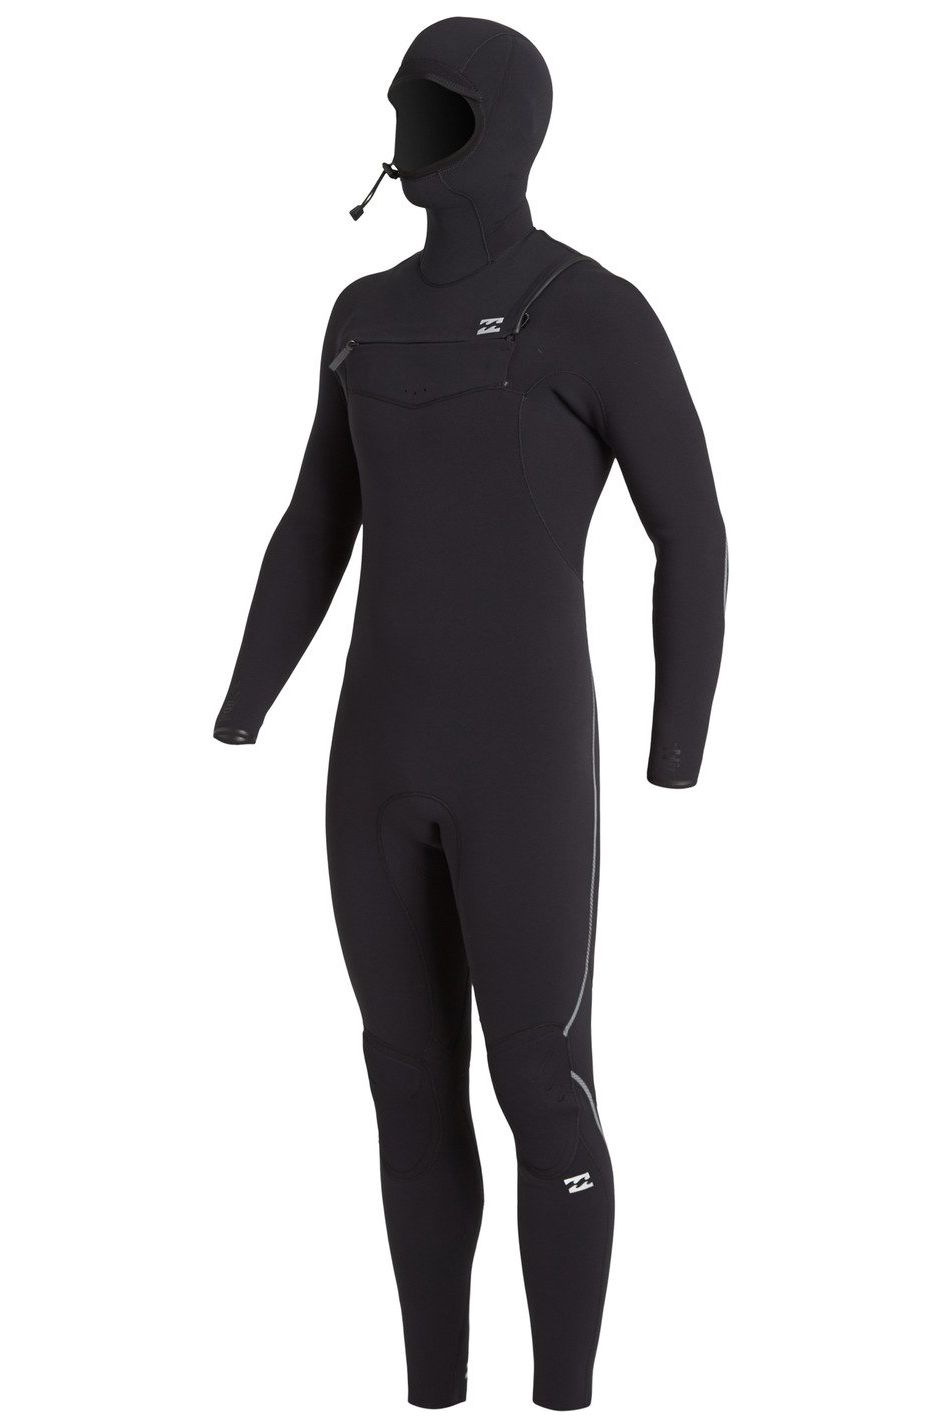 Billabong Wetsuit 403 FURN COMP CZ HD Black